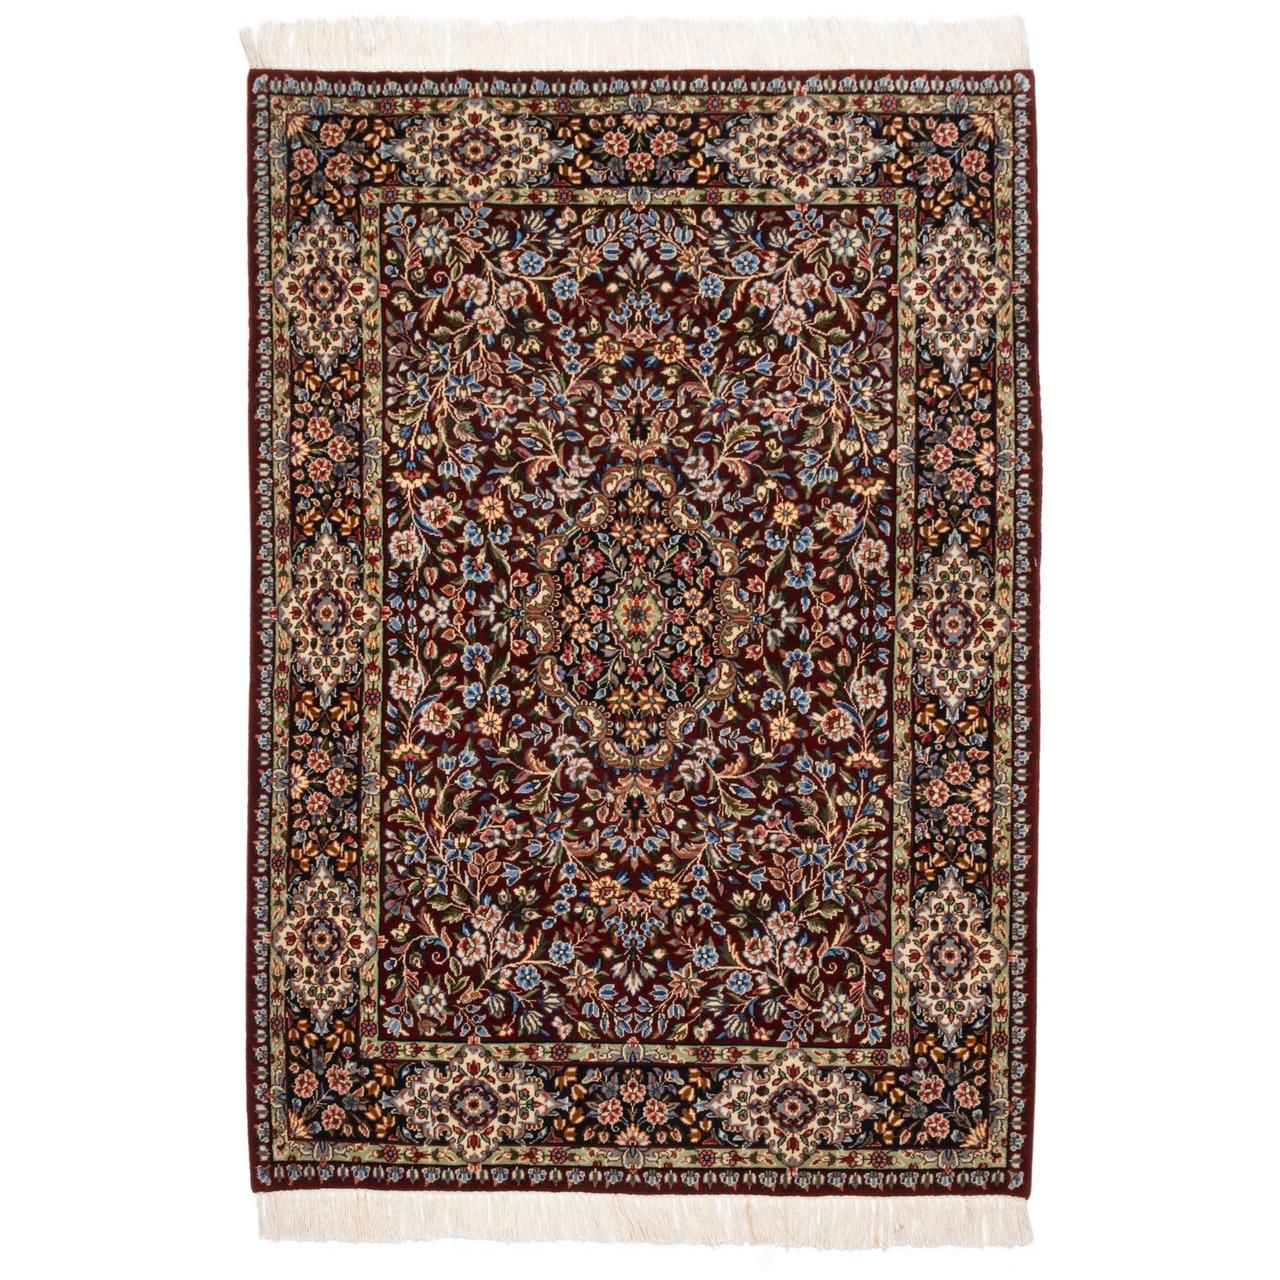 فرش دستباف ذرع و نیم سی پرشیا کد 174058